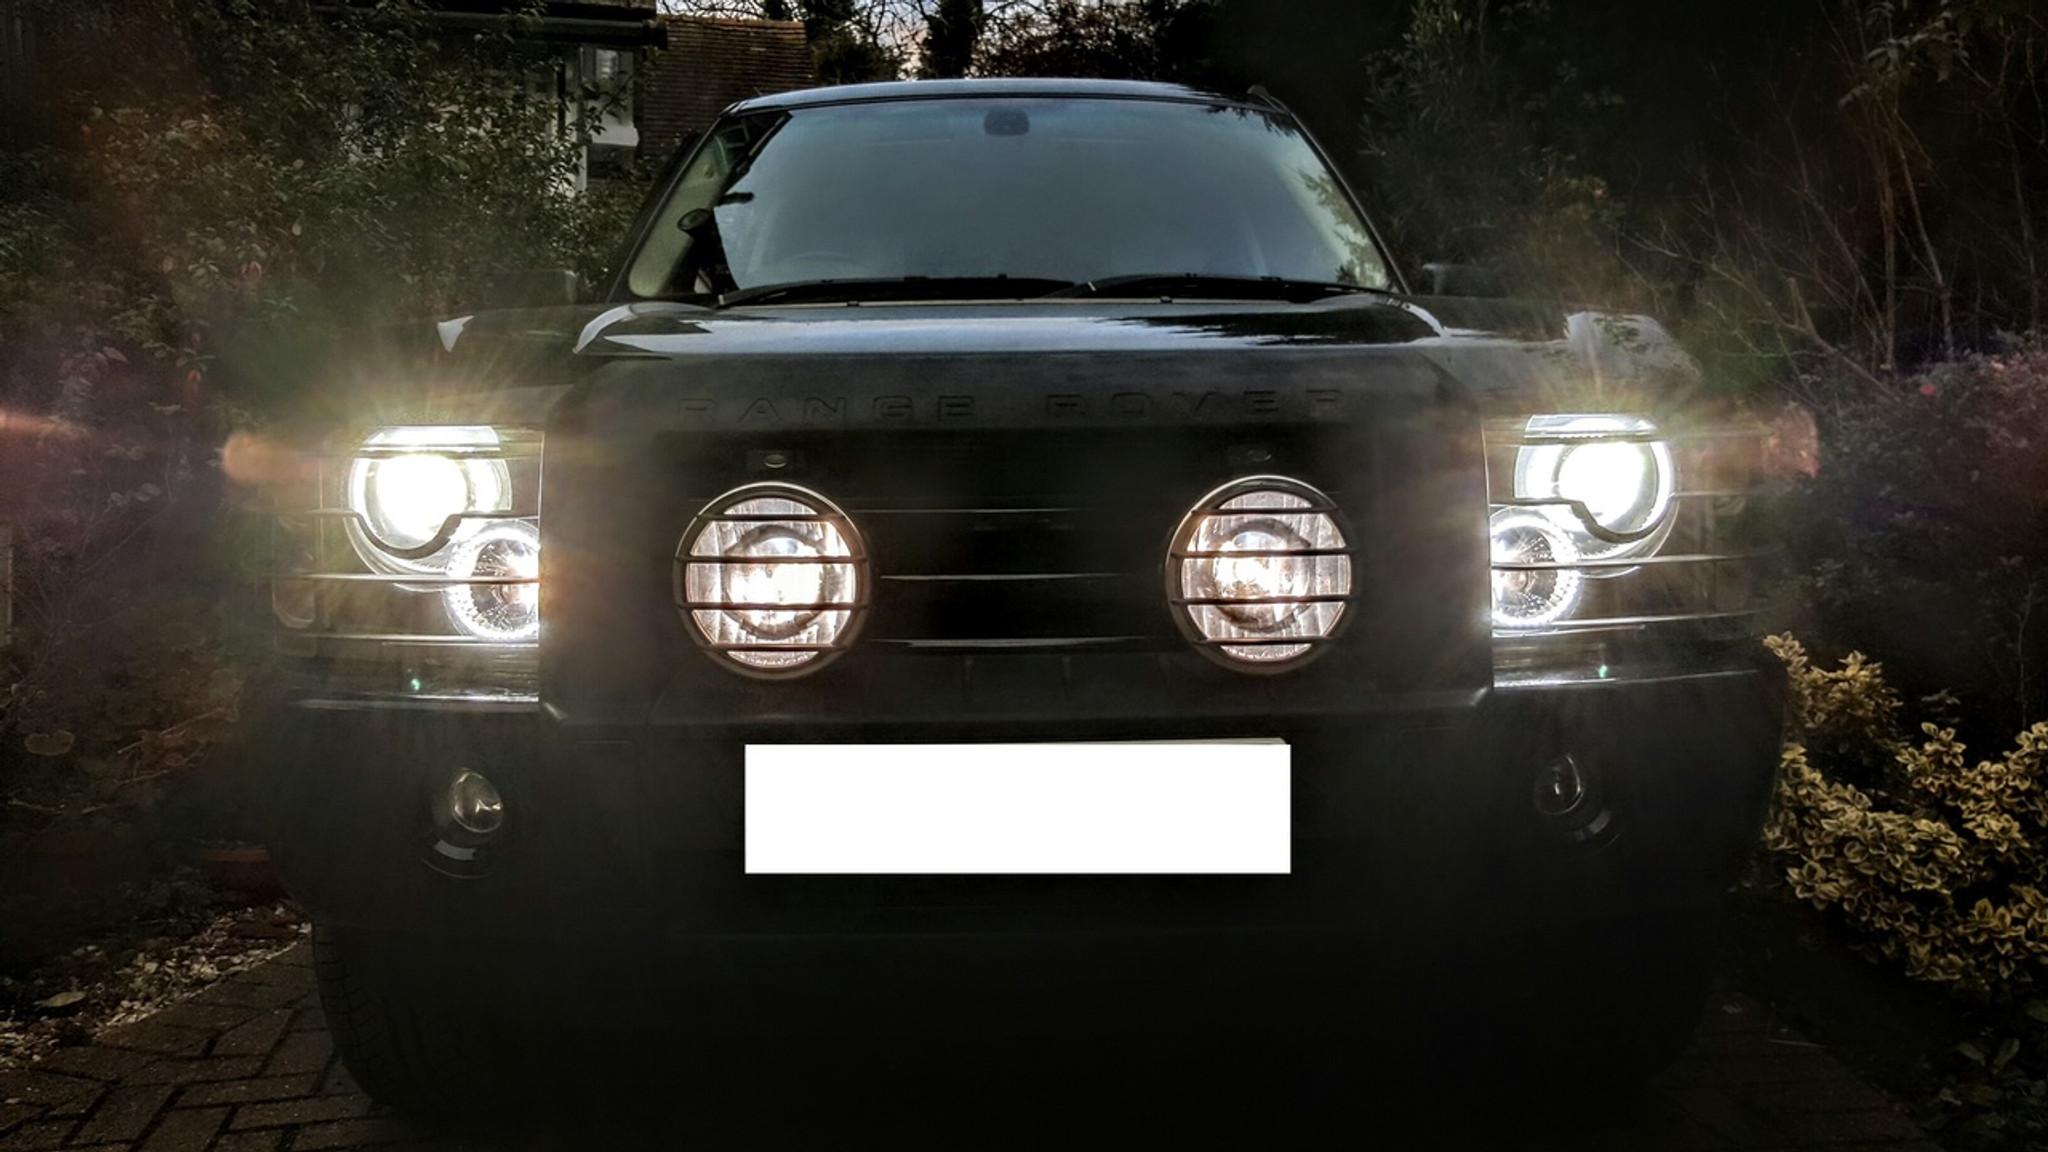 Range Rover Headlight Conversion To Led Spec 2002 2004